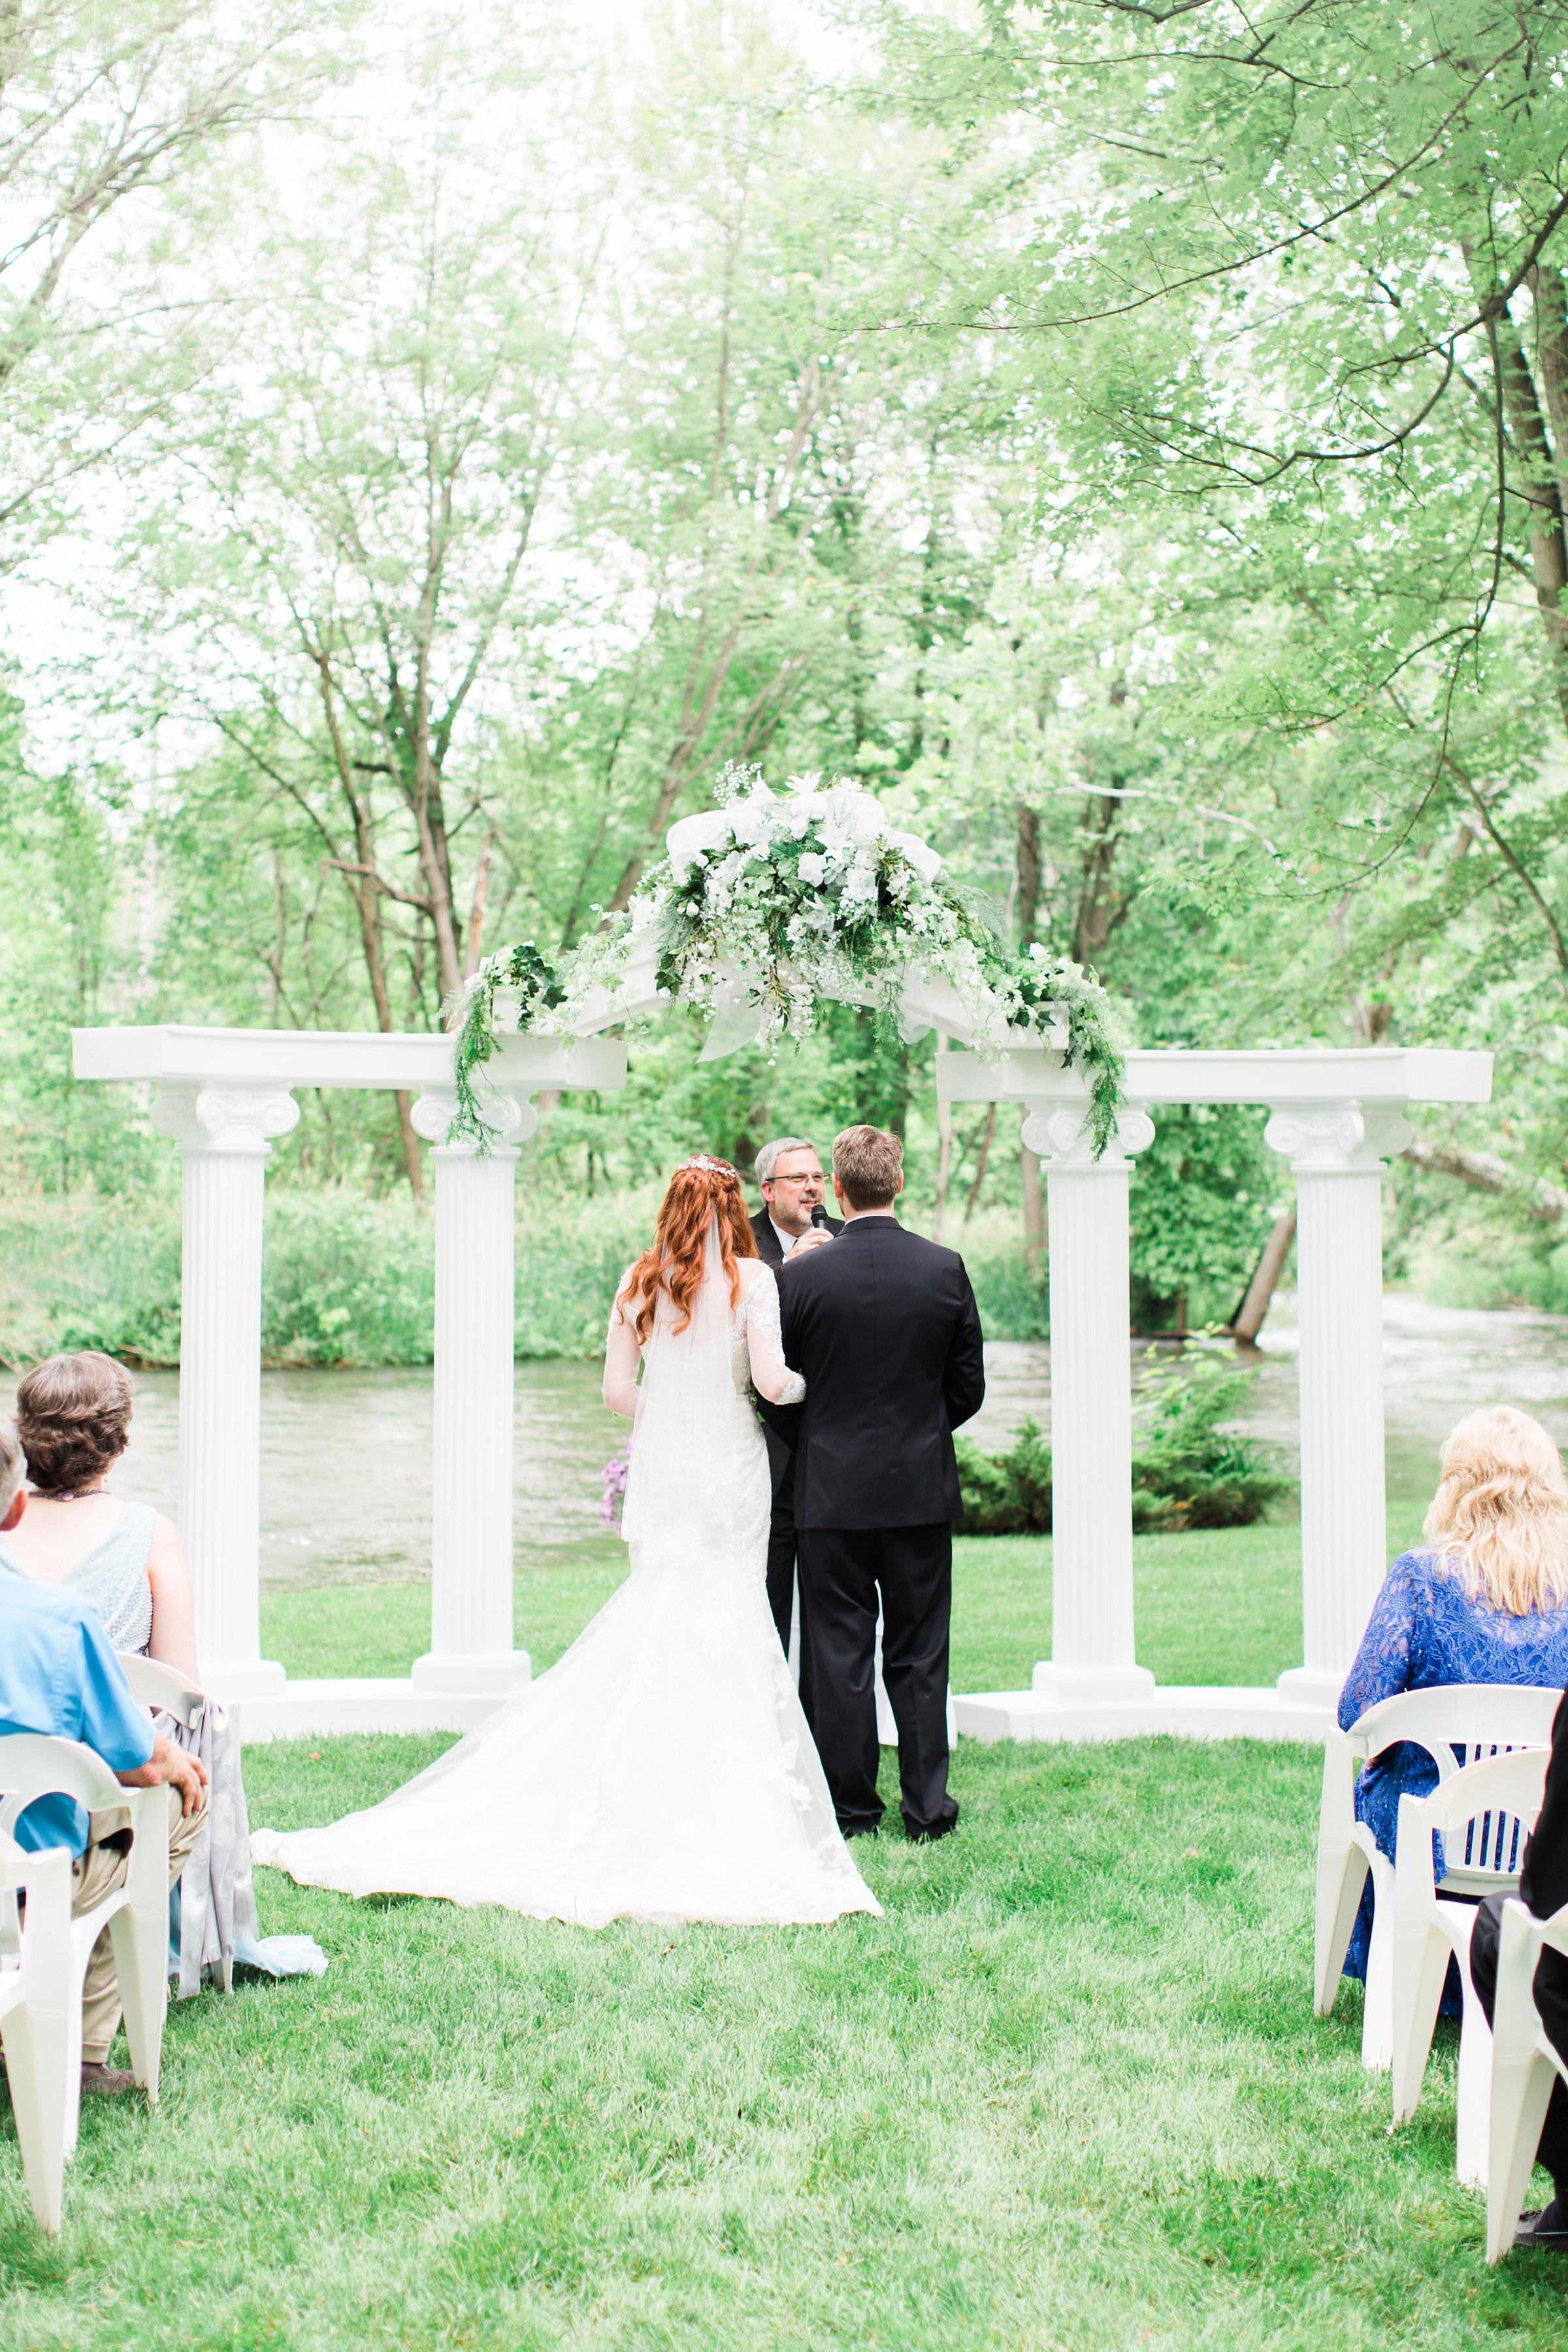 Conger+Wedding+Ceremony-58.jpg